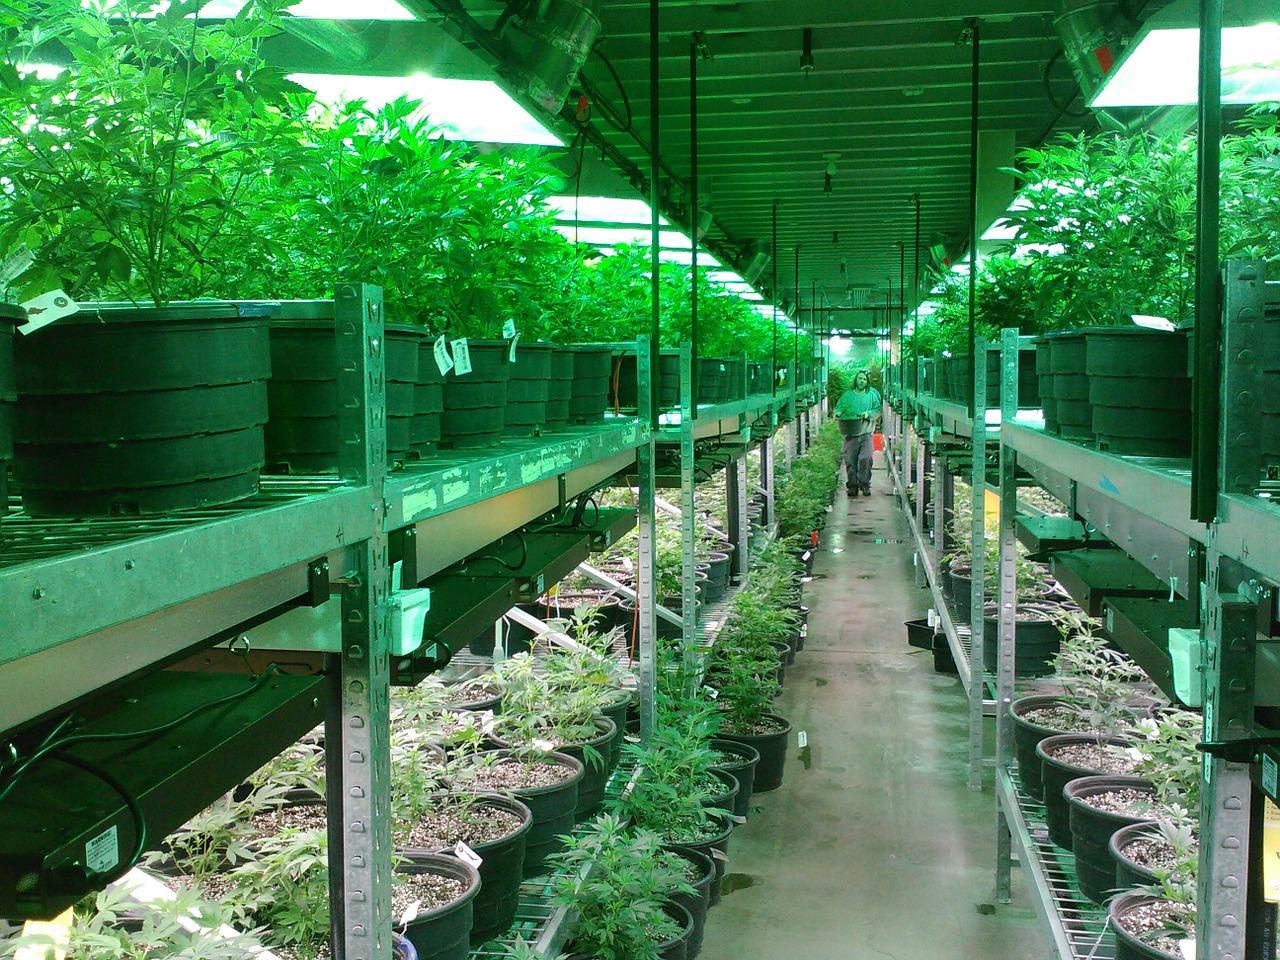 Michigan Medical Marijuana Licensees Must Obtain Business Insurance